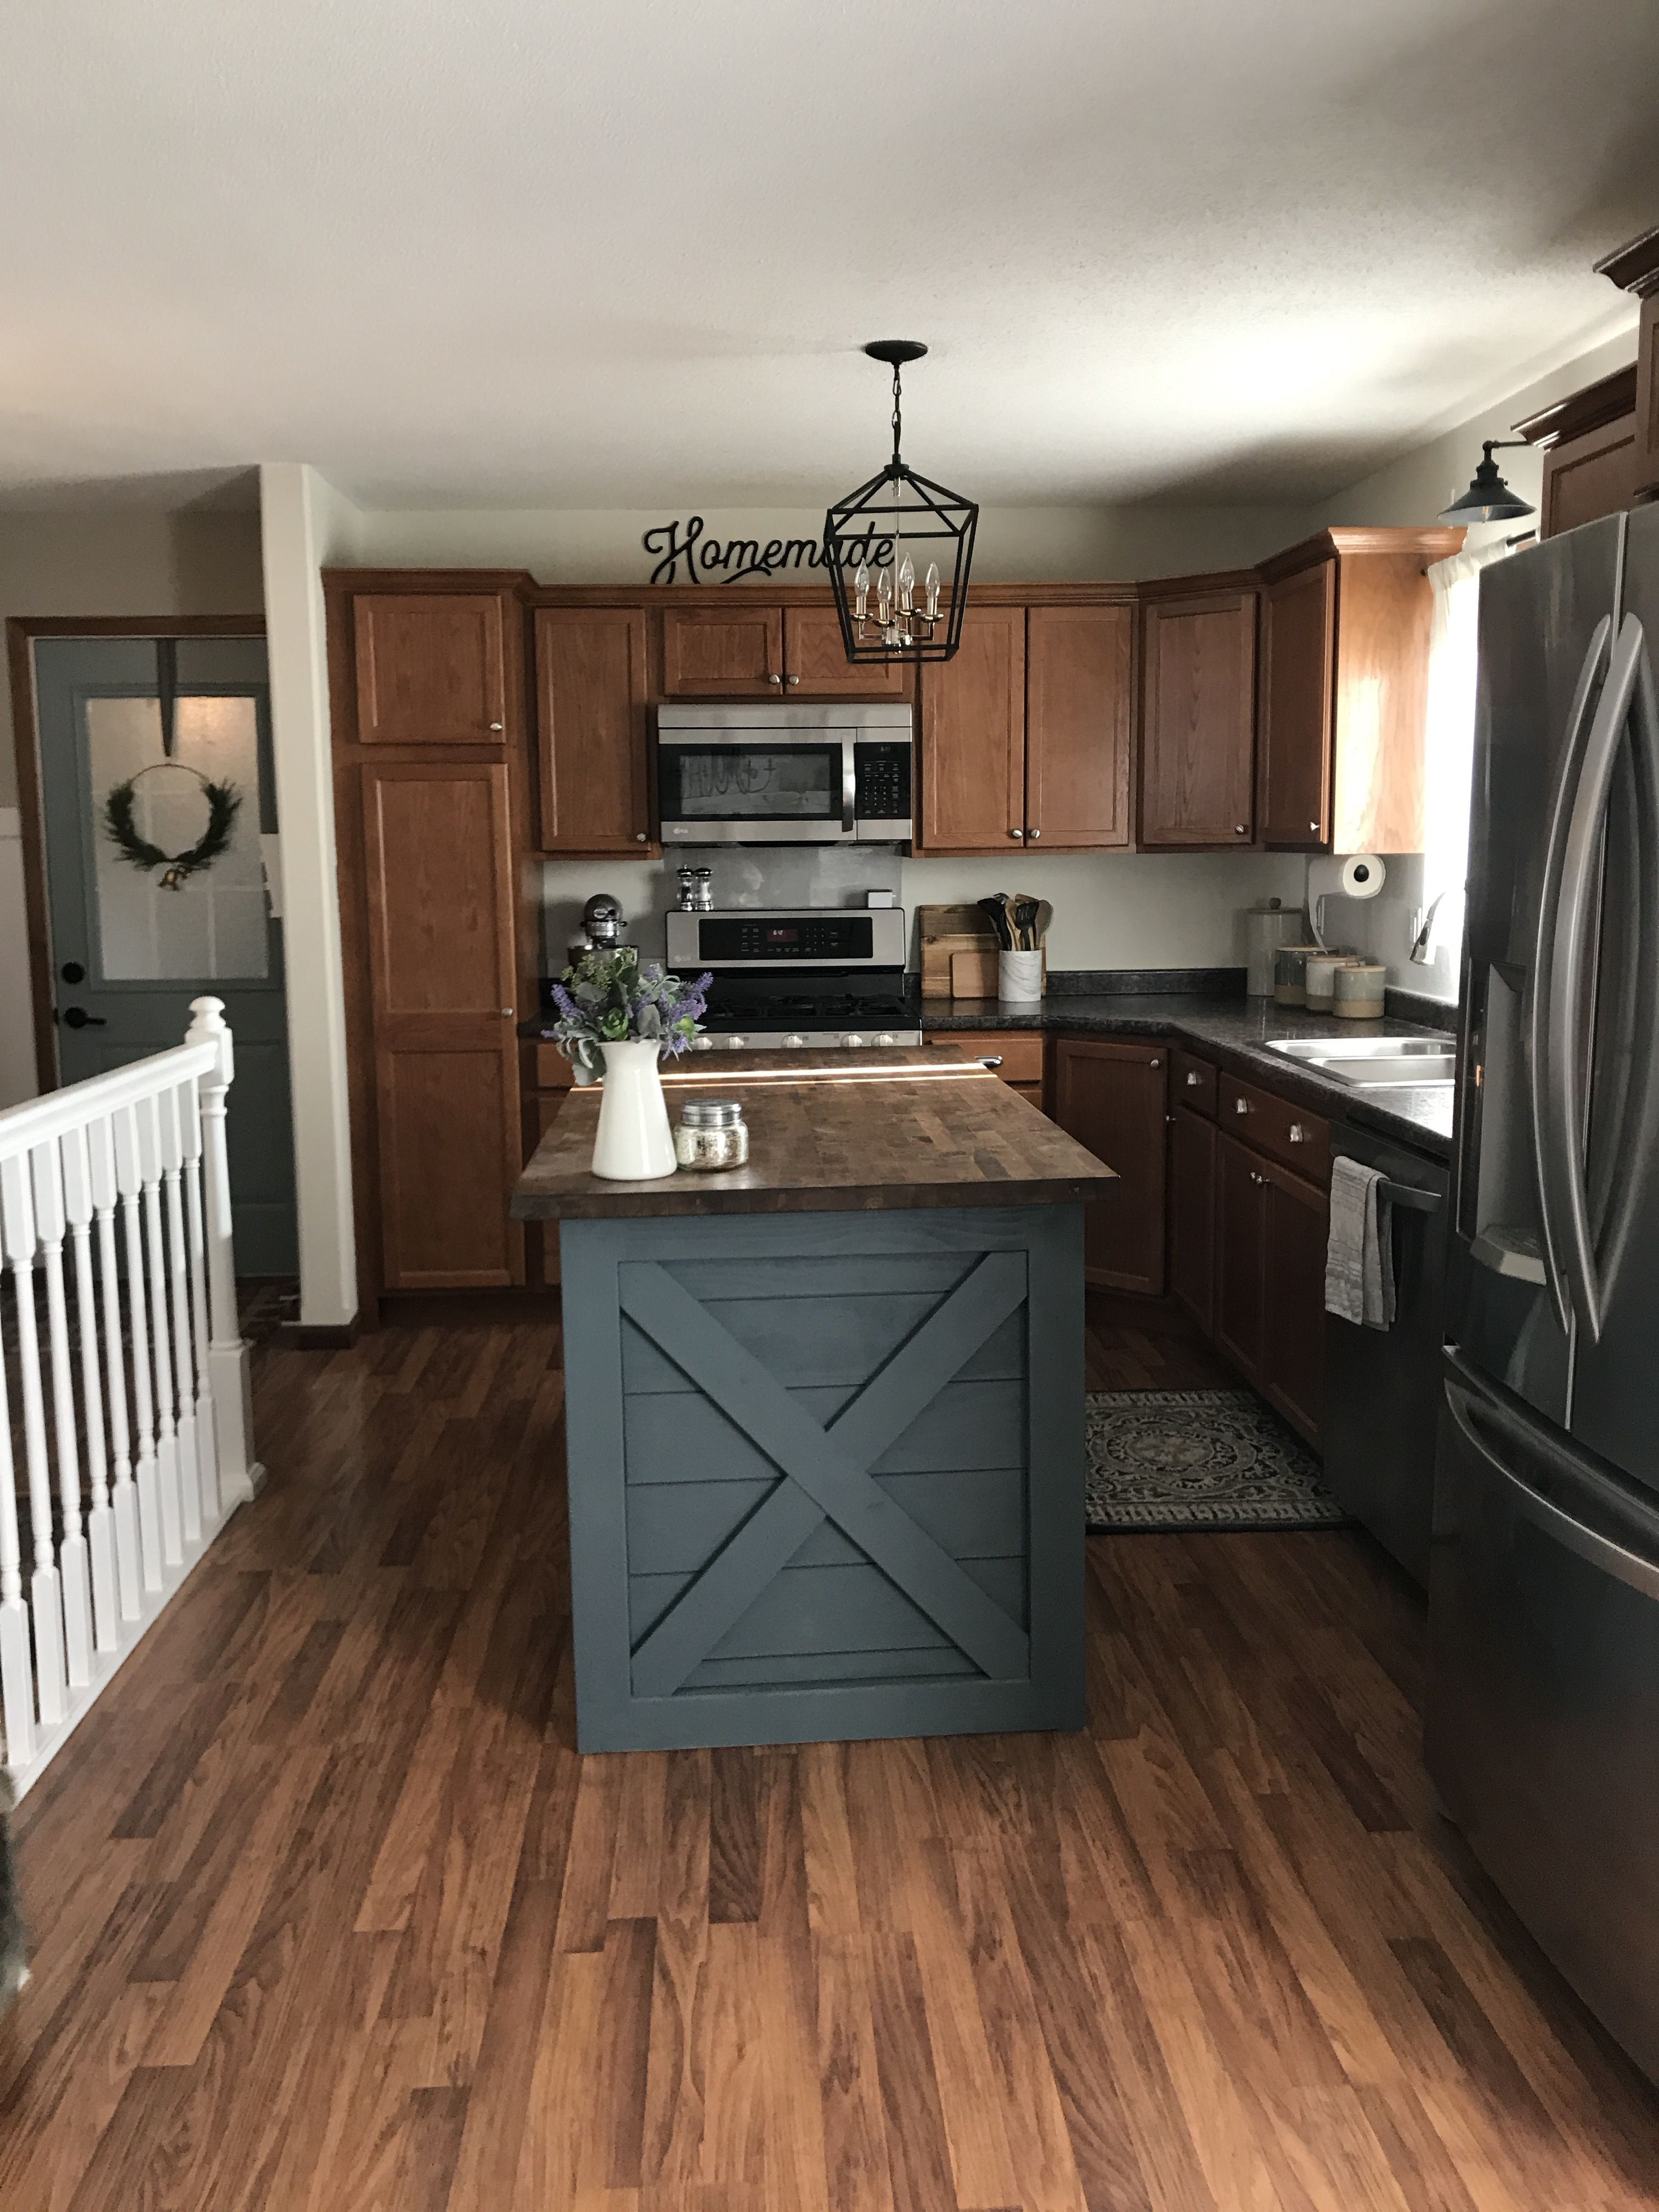 Clever Ways To Design Your Kitchen Island (Update)